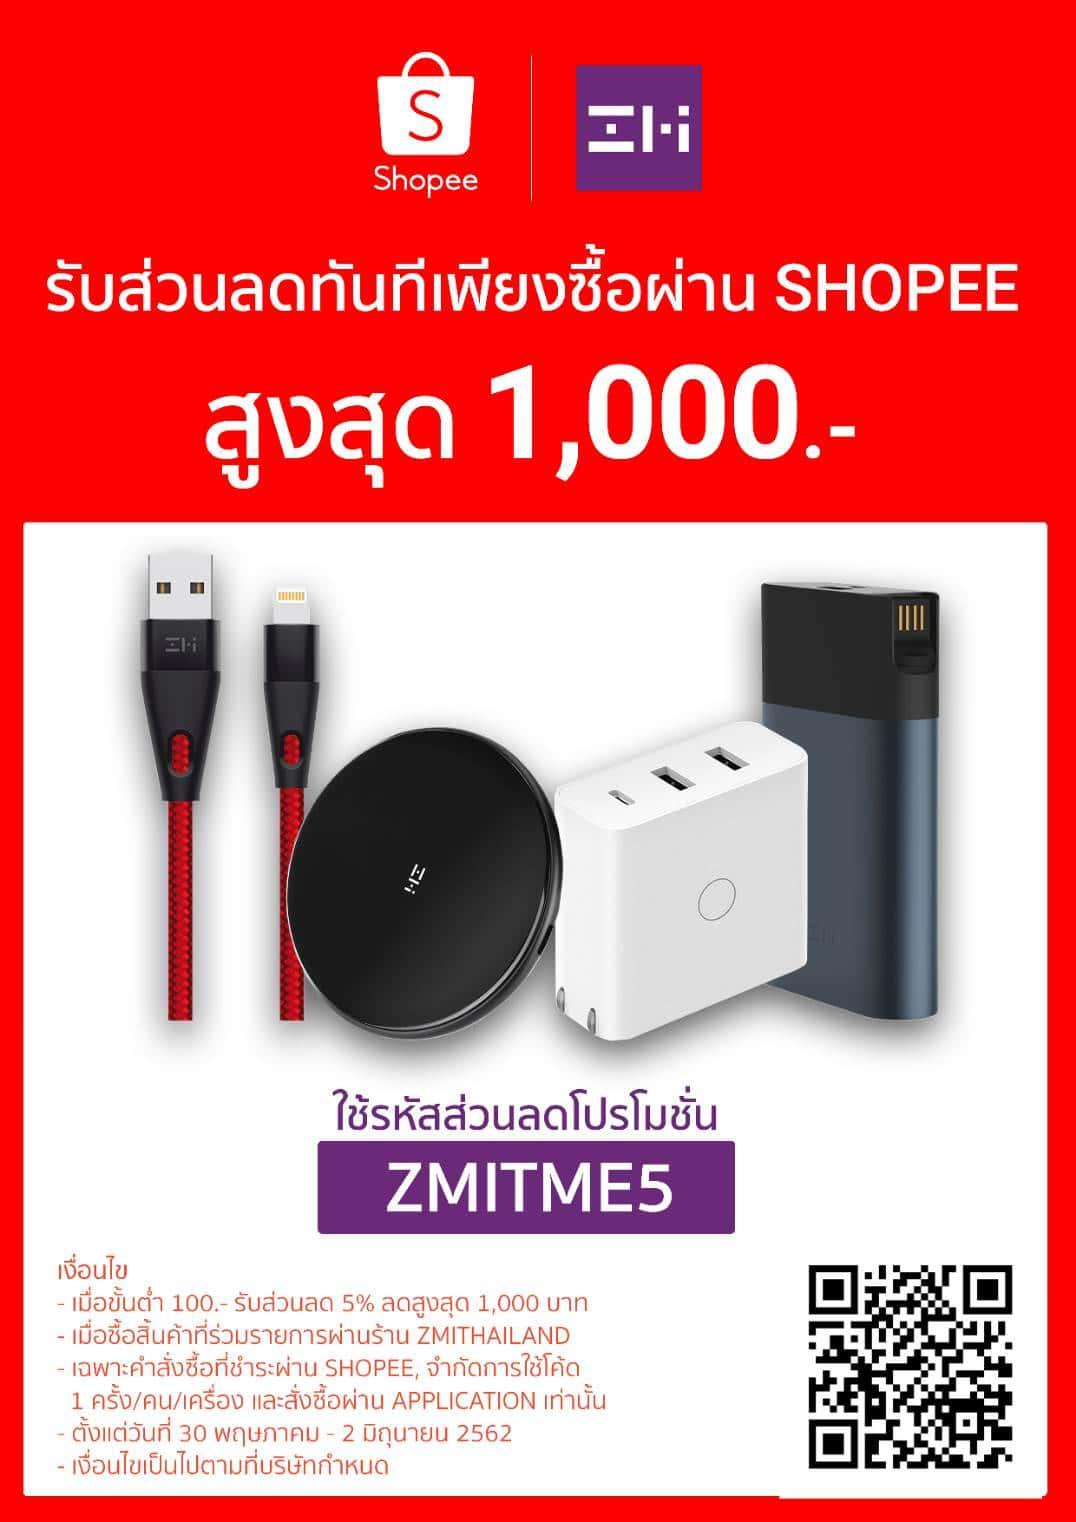 zmi zmi thailand - แนะนำสินค้าเด่นจาก ZMI Thailand ตัวแทนอย่างเป็นทางการ